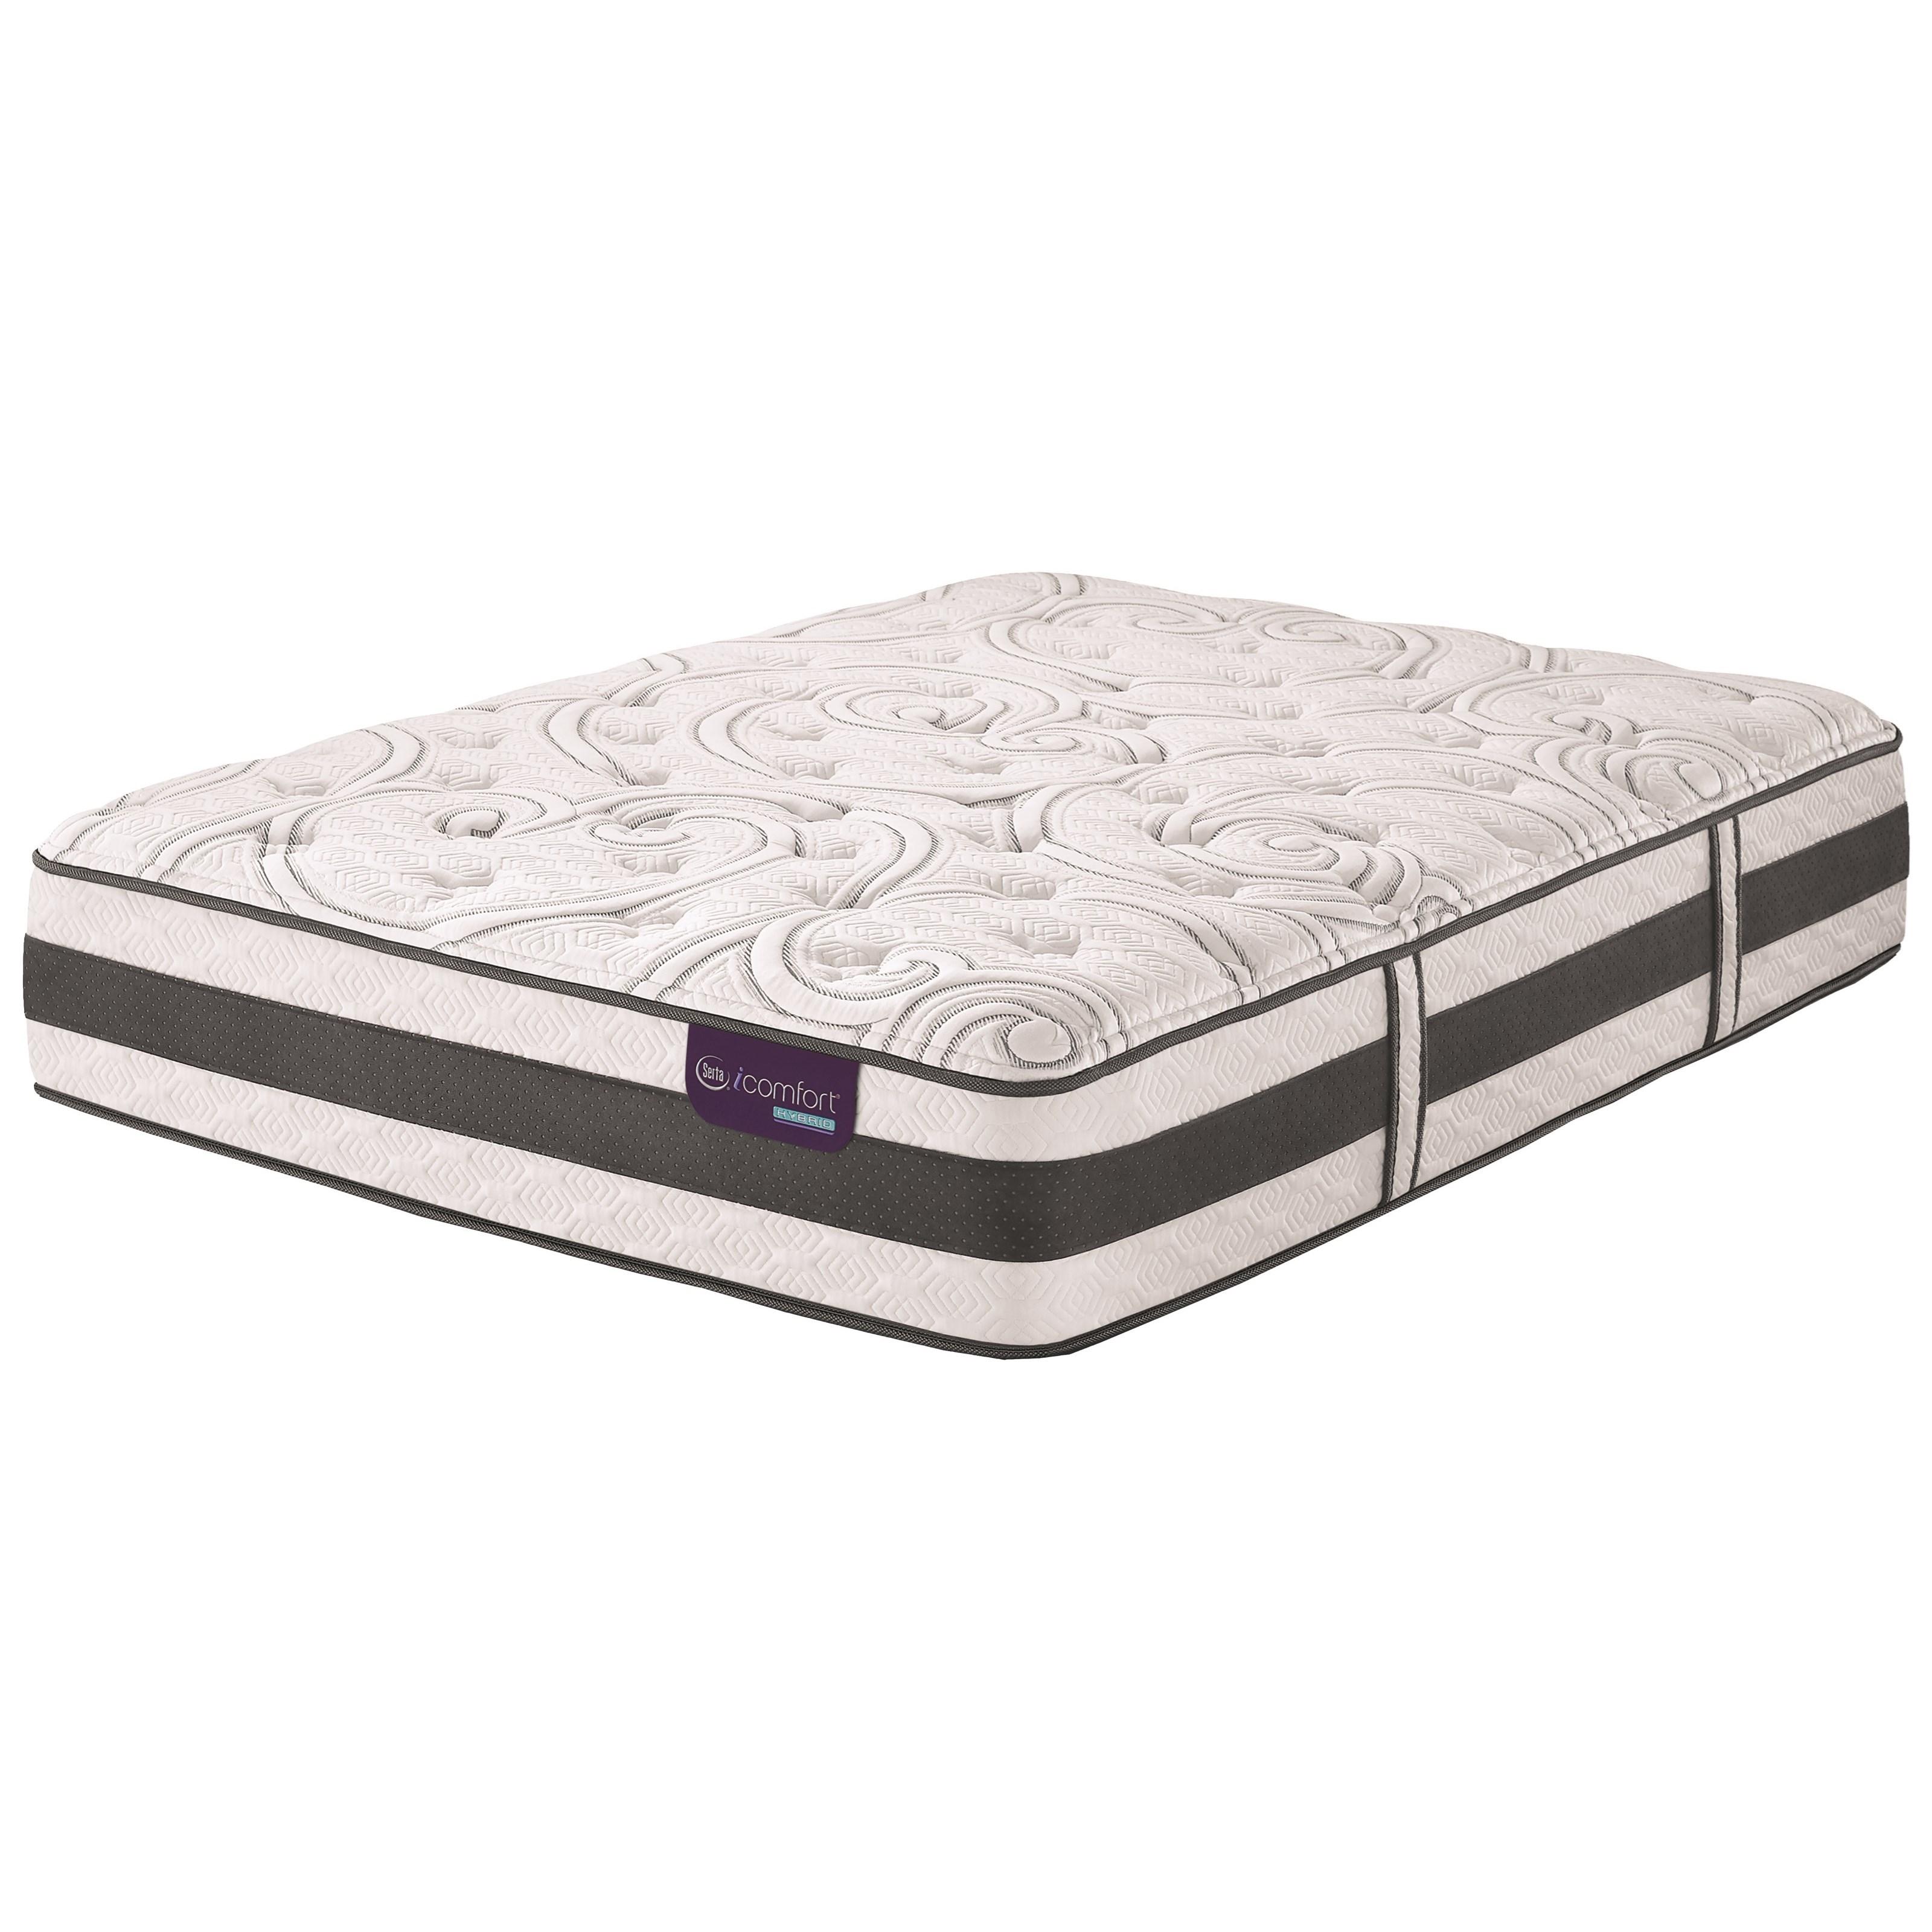 Serta iComfort Hybrid Recognition Split King Plush Hybrid Quilted Mattress - Item Number: RecgntnPlush-TXLK